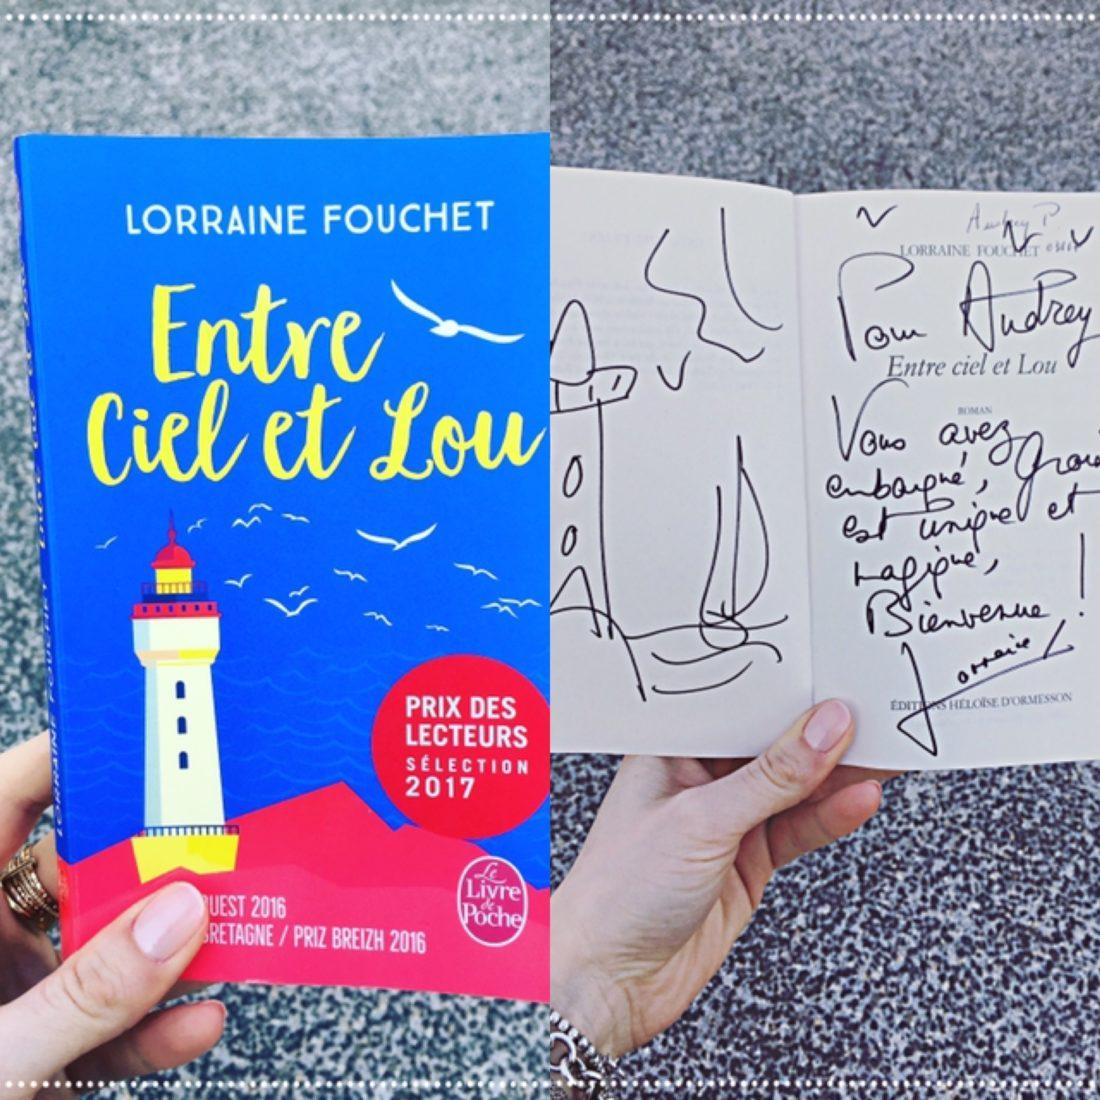 booksnjoy - entre ciel et lou - lorraine fouchet - feel-good